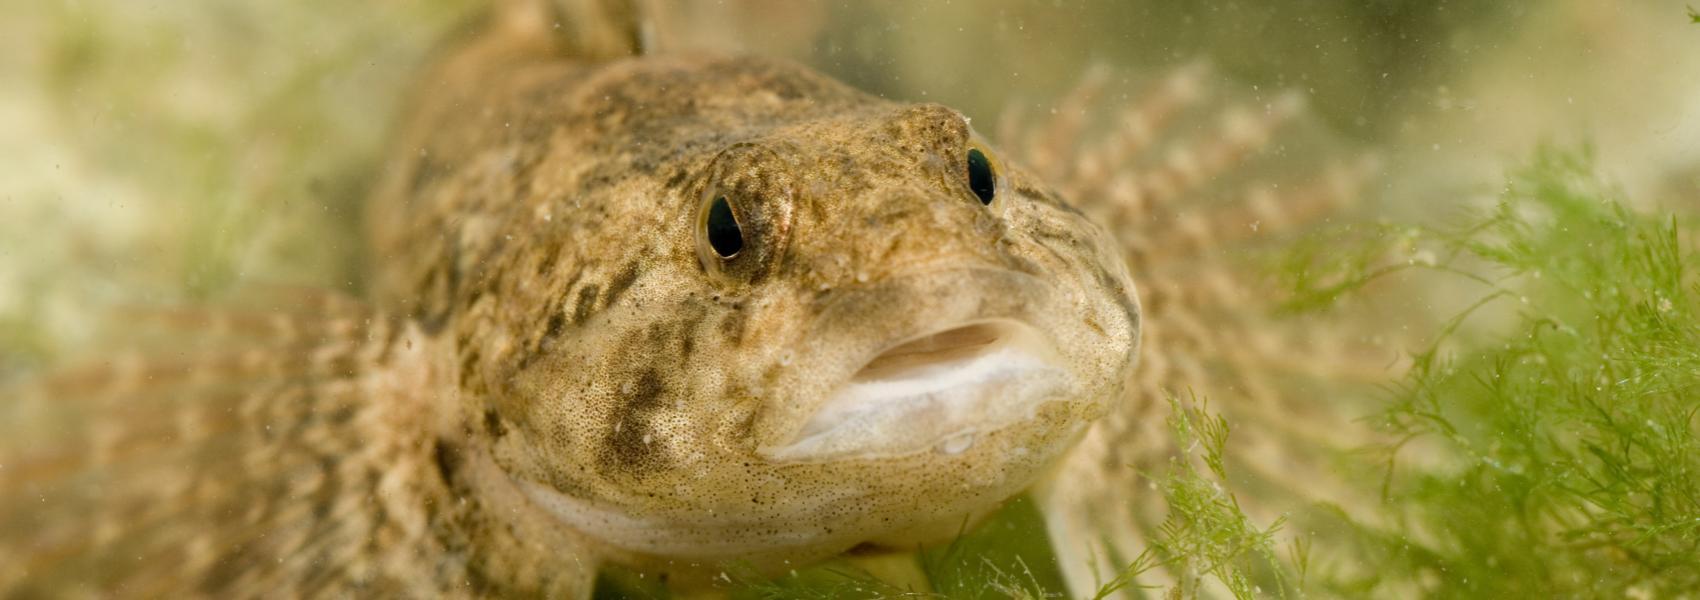 rivierdonderpad